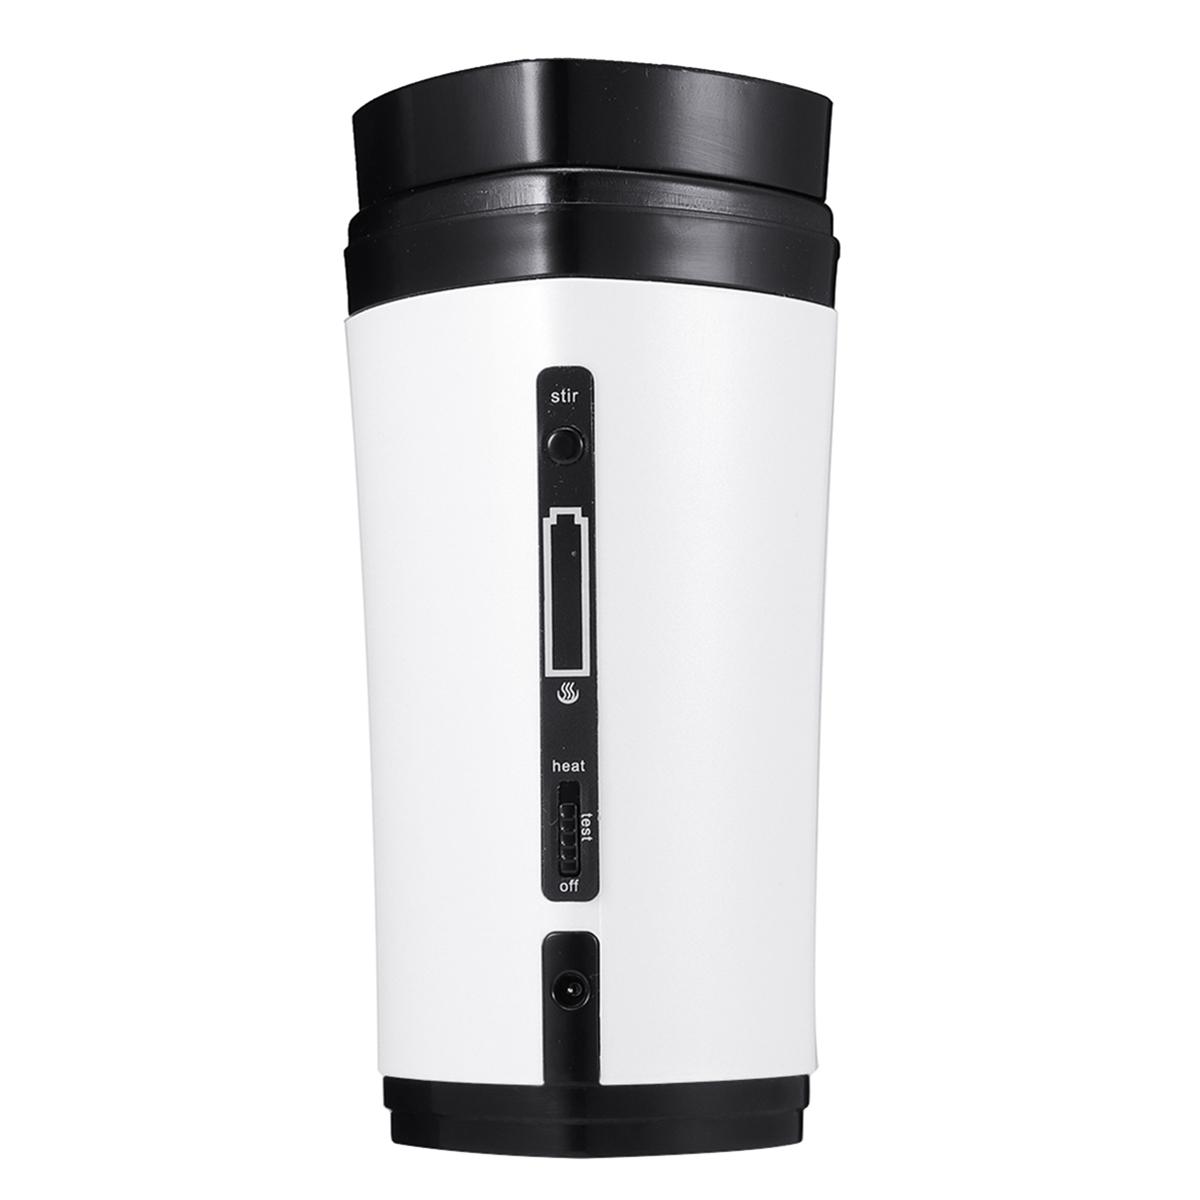 USB-чашкадлякофеПерезаряжаемыйнагревSelf Stirring Mixing Mug Warmer Coffee Capsule Cup